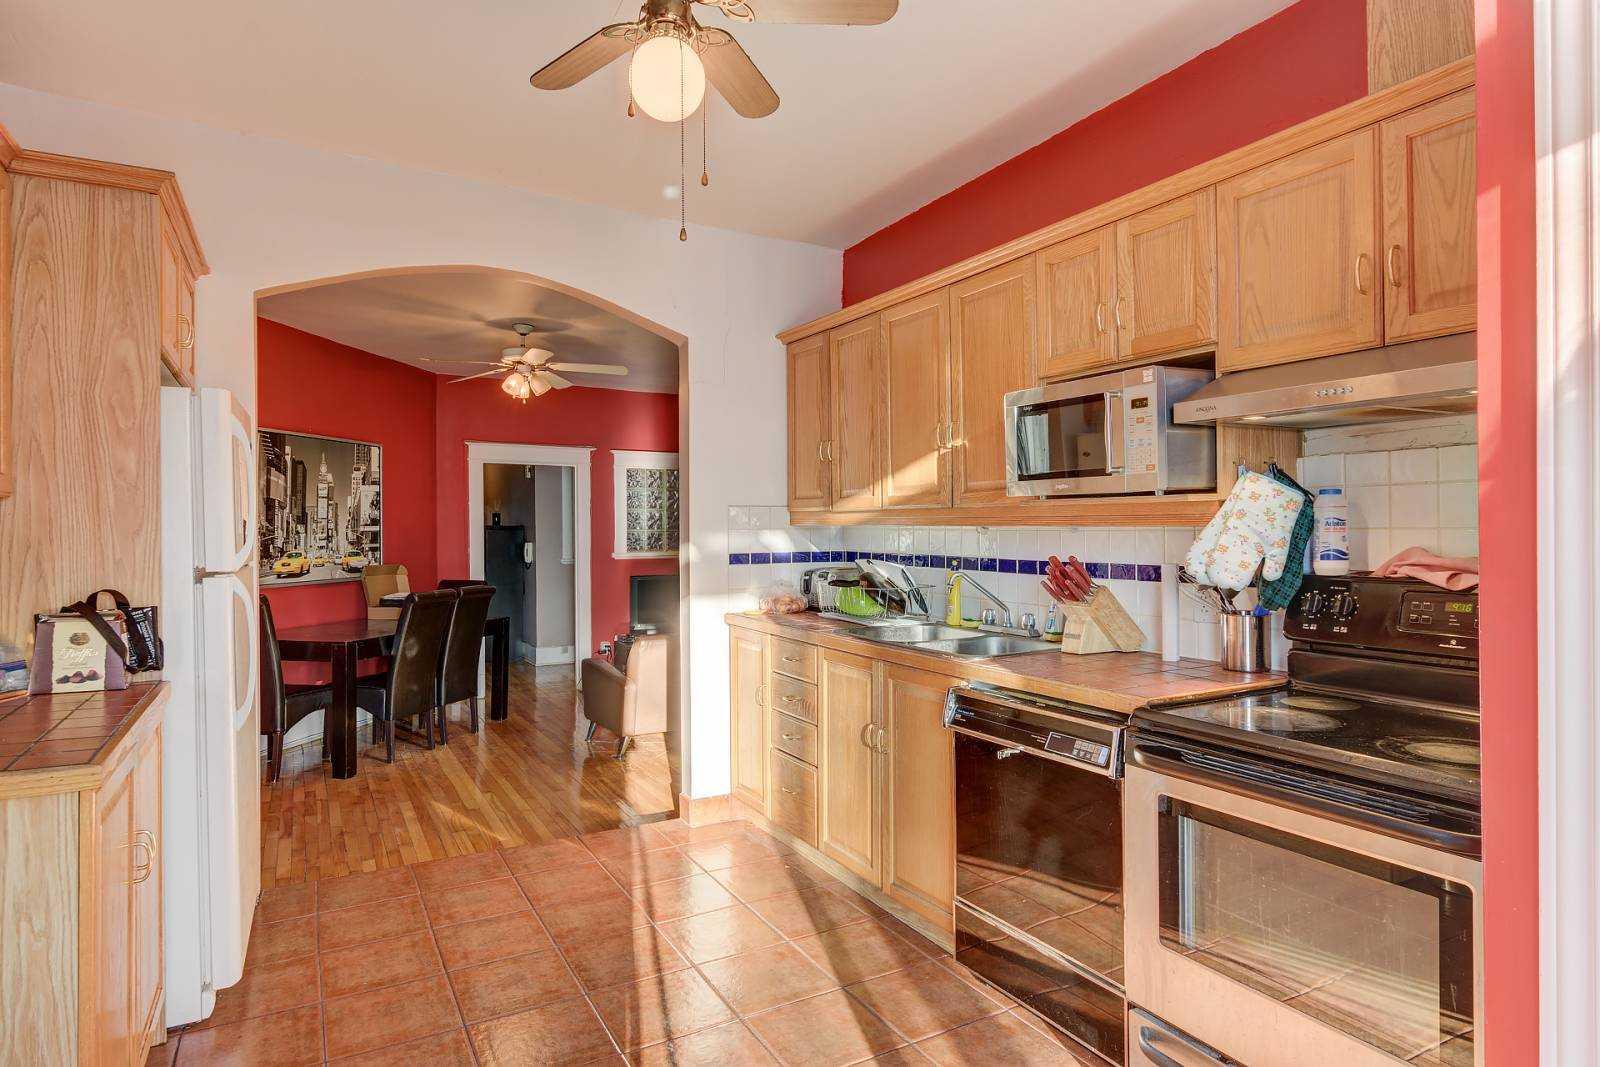 rooms-to-rent-mtl-kitchen-1